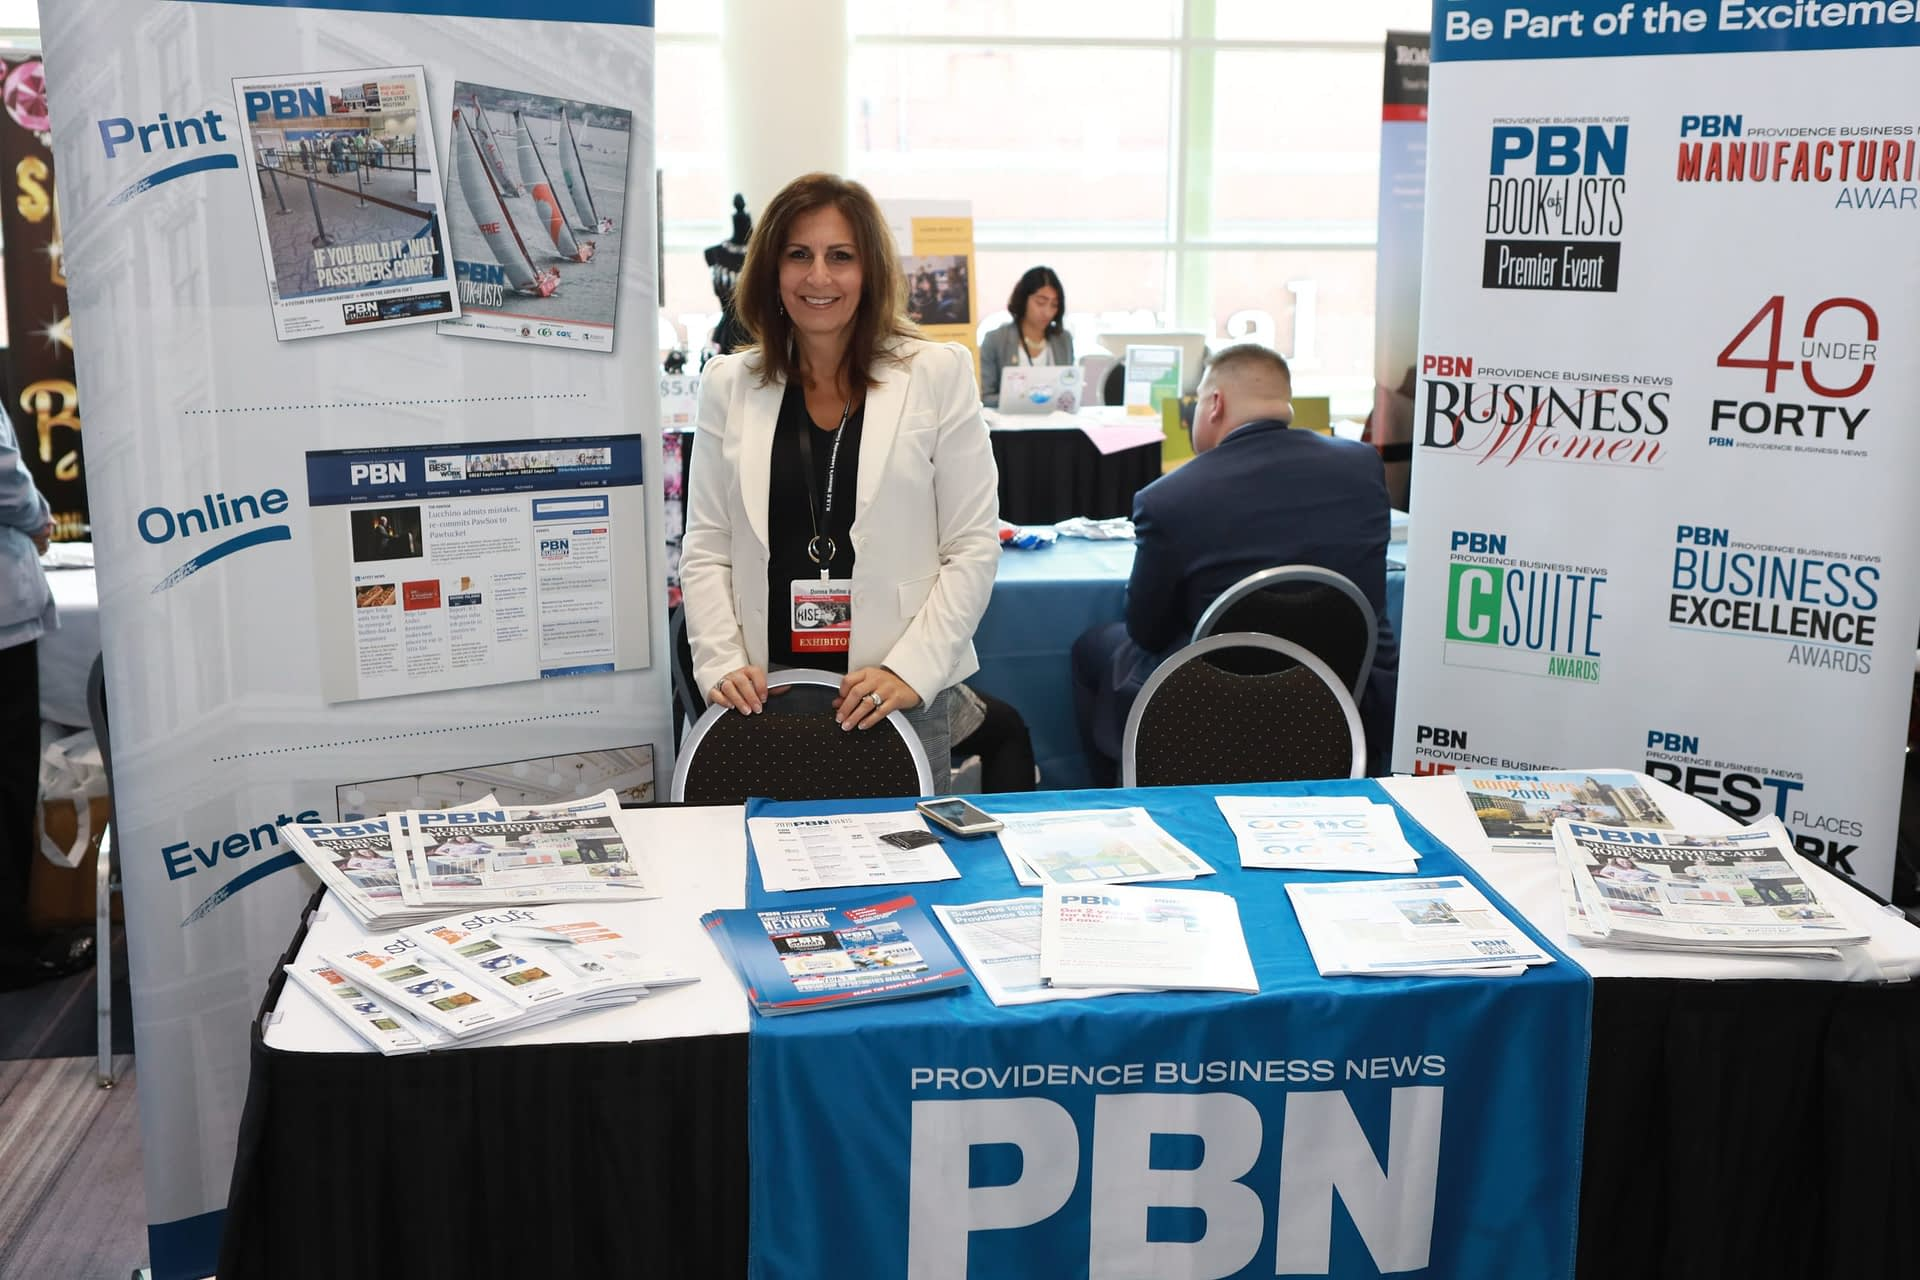 PBN partners